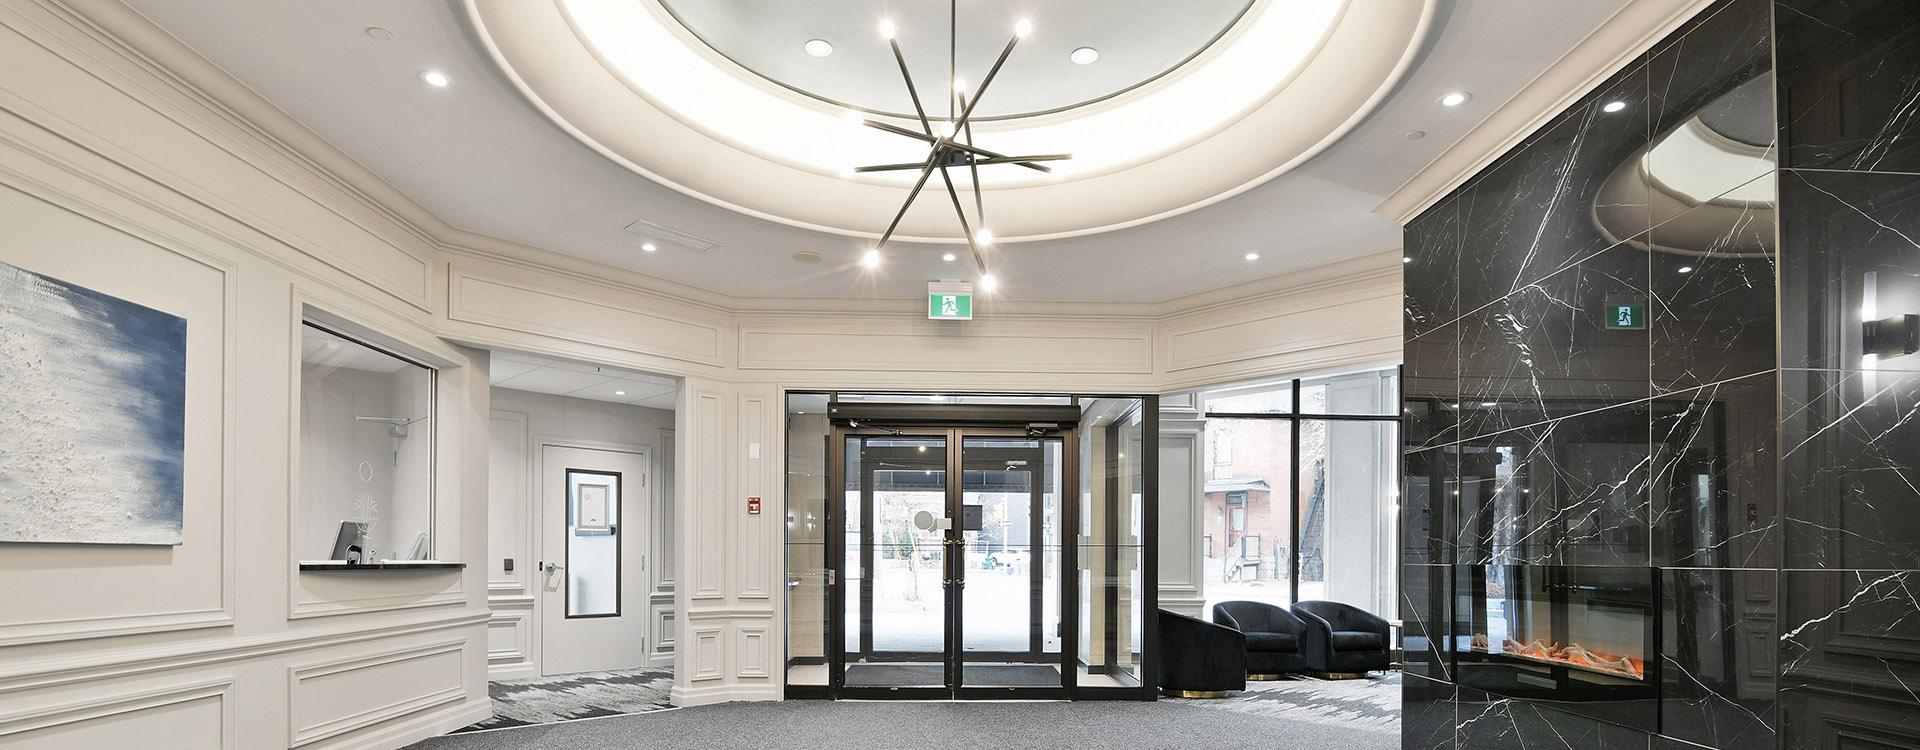 the-carlisle-221-lyon-street-north-ottawa-lobby